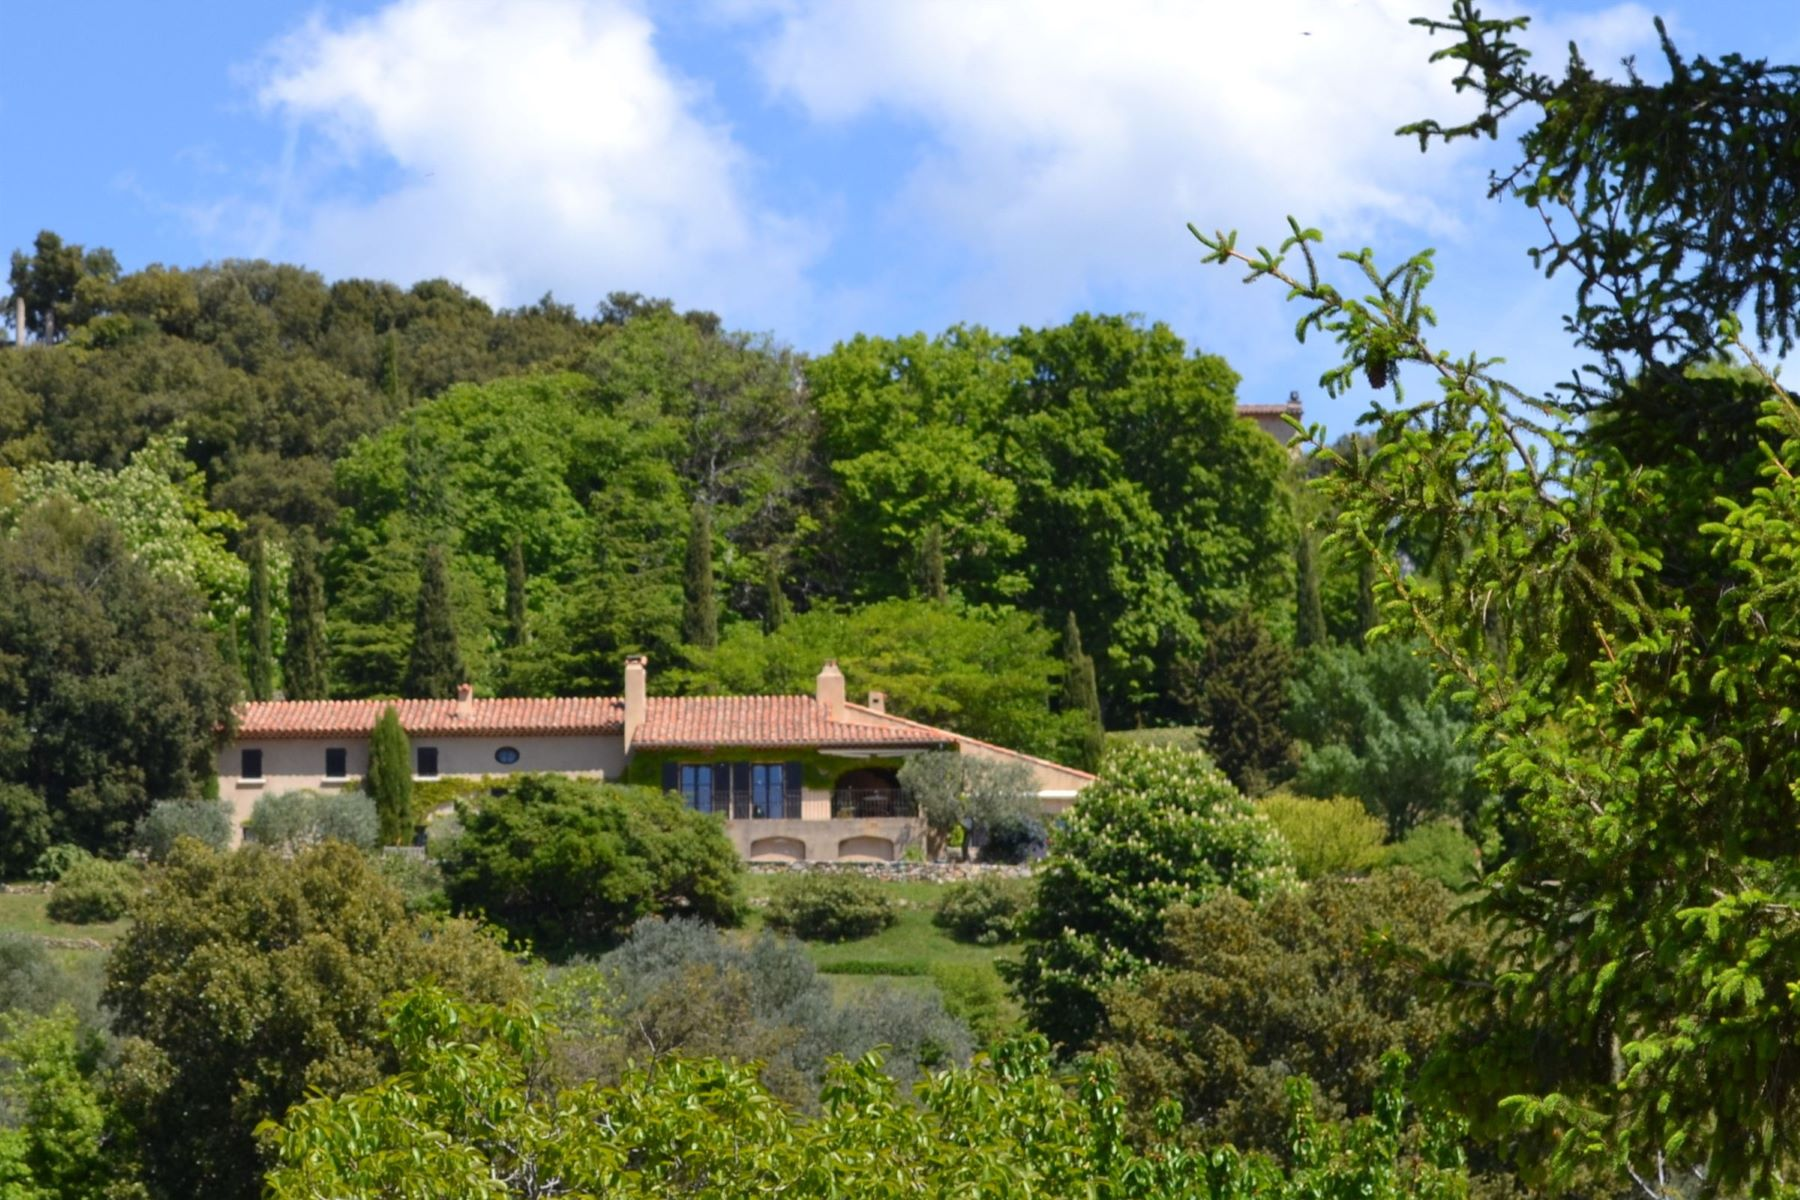 Single Family Homes por un Venta en UNDER OFFER: BEAUTIFUL PROPERTY ON 2,14 HA Tourtour, Provincia - Alpes - Costa Azul 83690 Francia